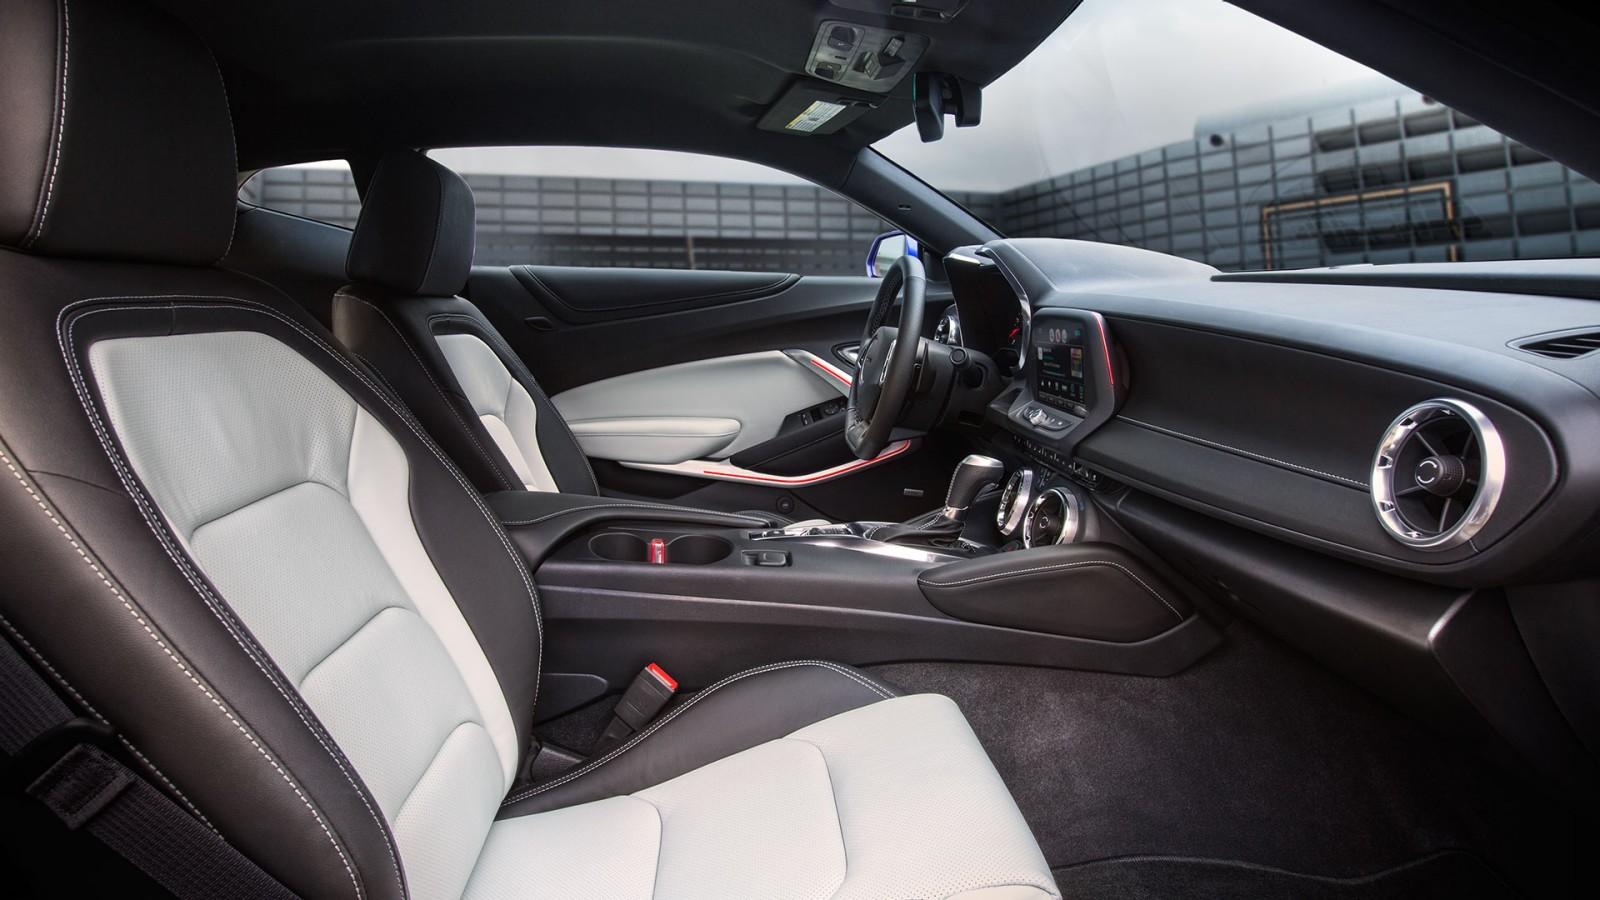 New Chevrolet Camaro Interior main image